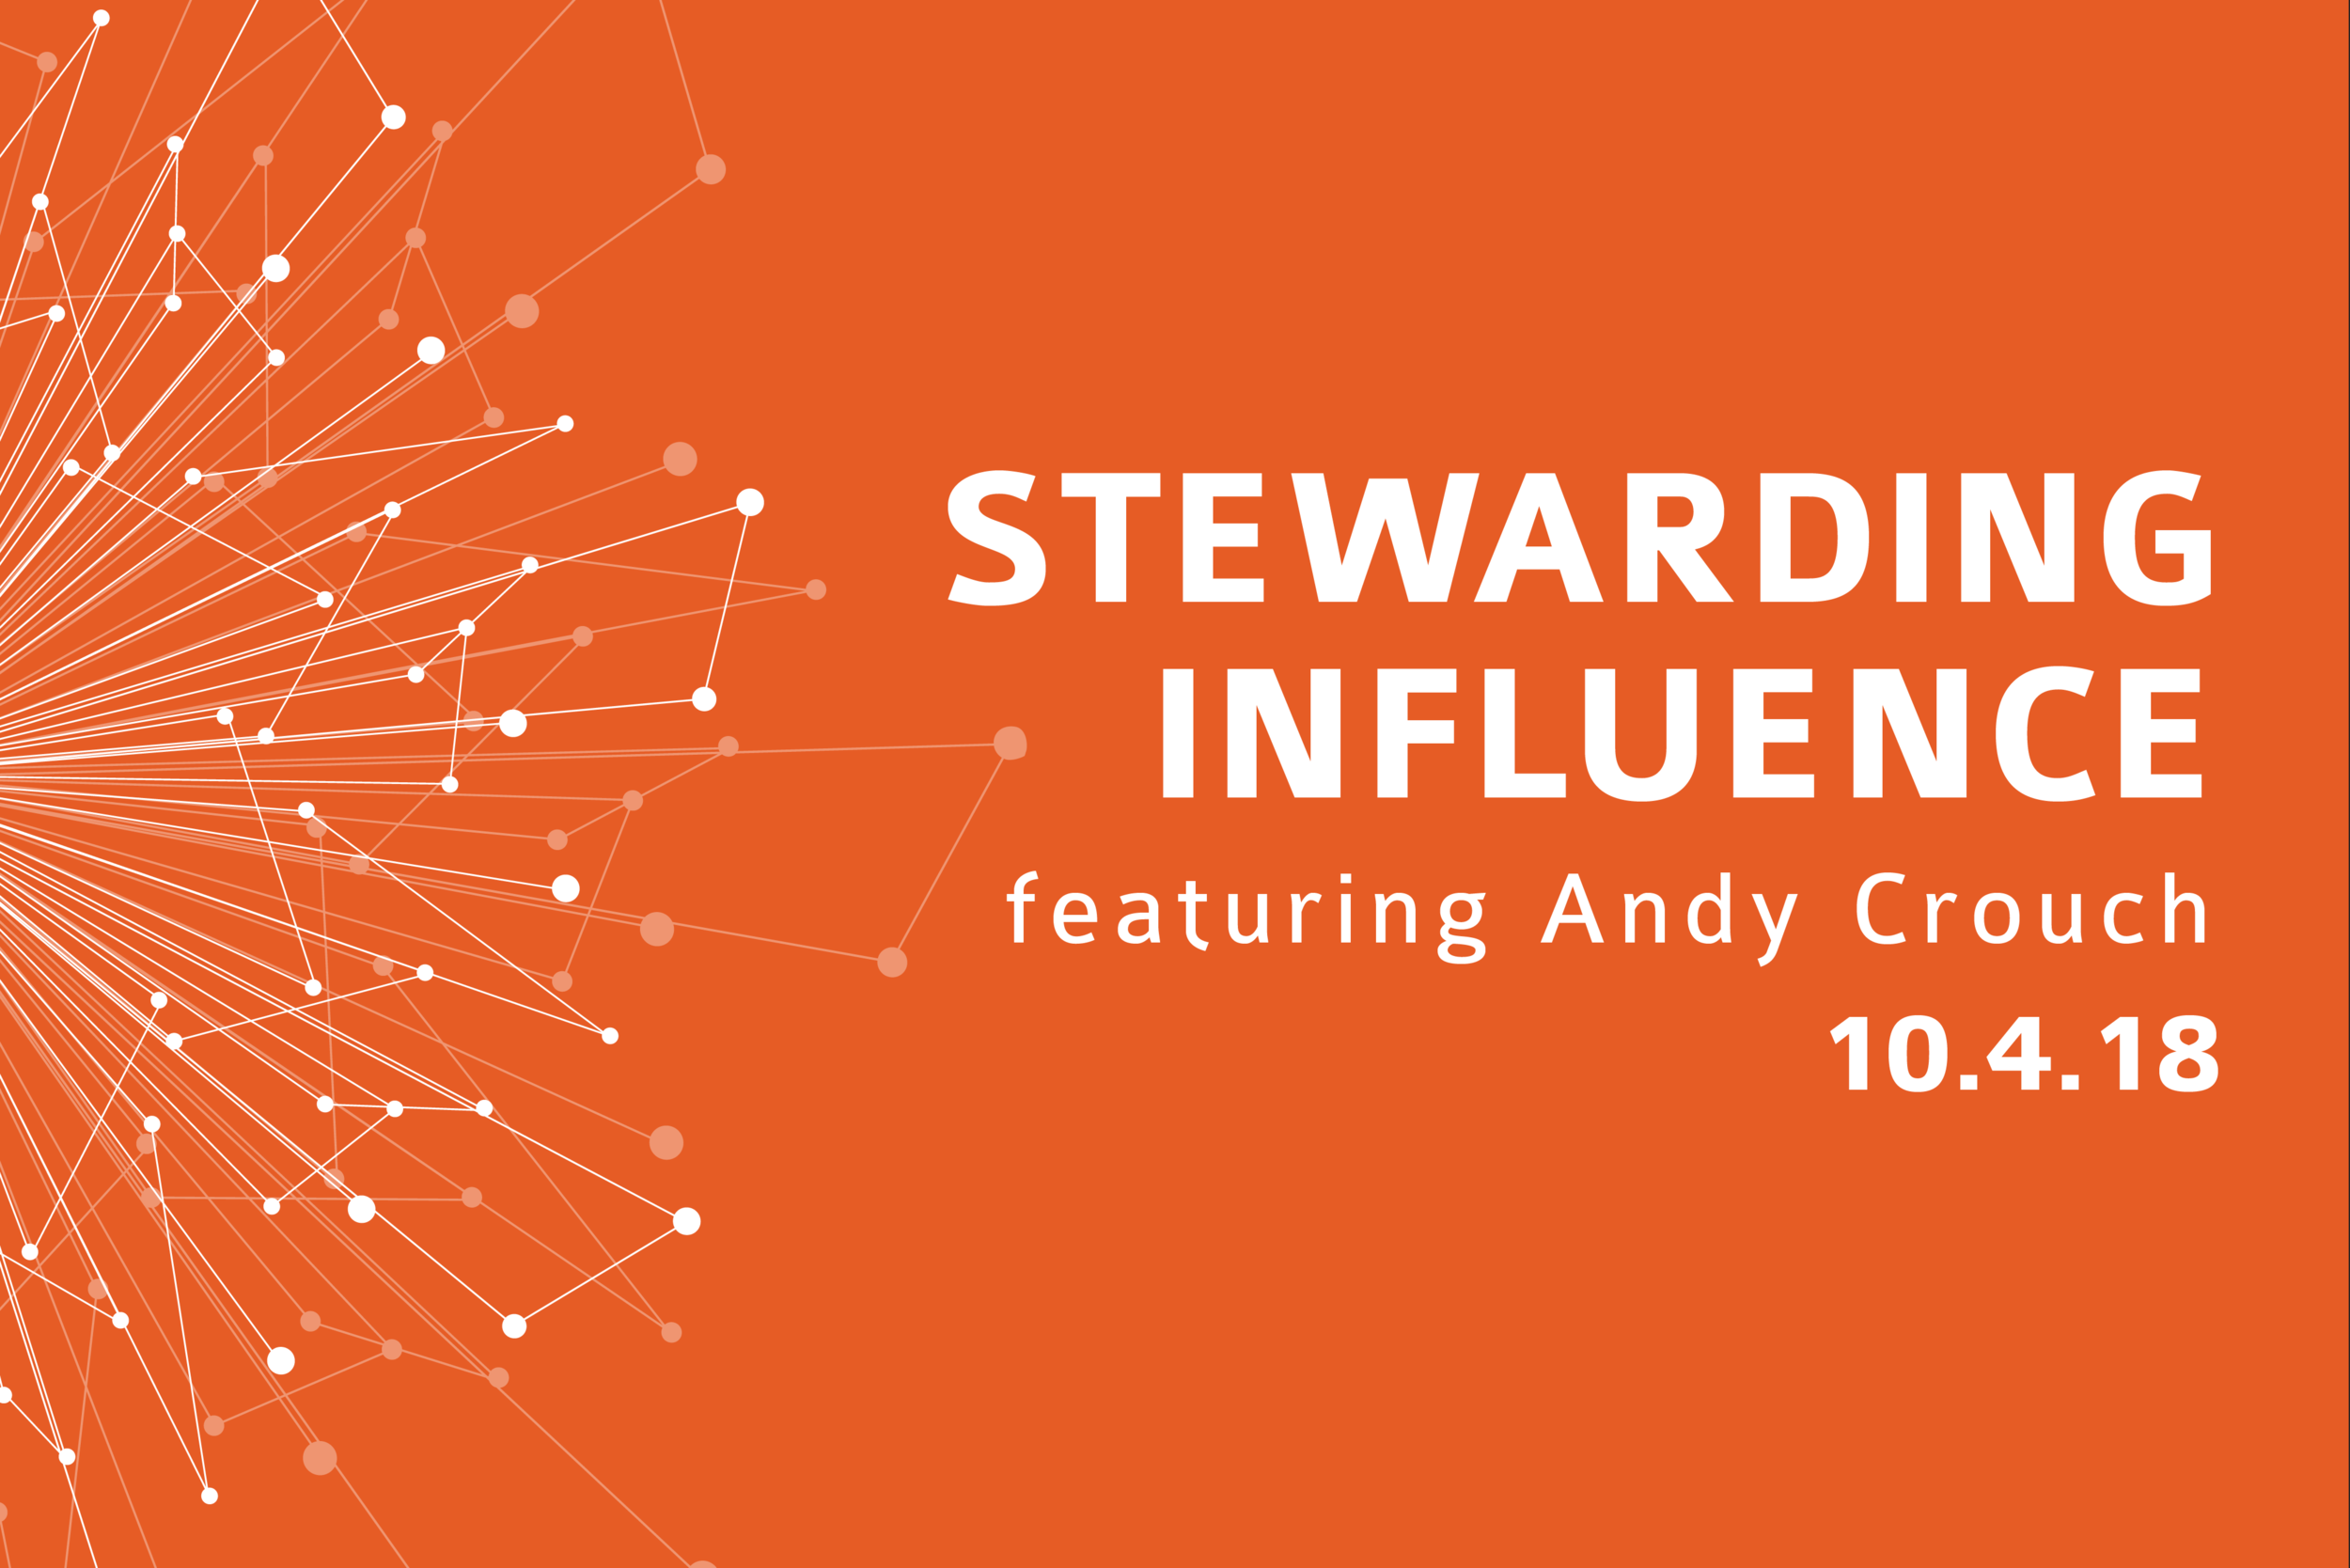 StewardingInfluence_NIFWwebsite-14 (1).png